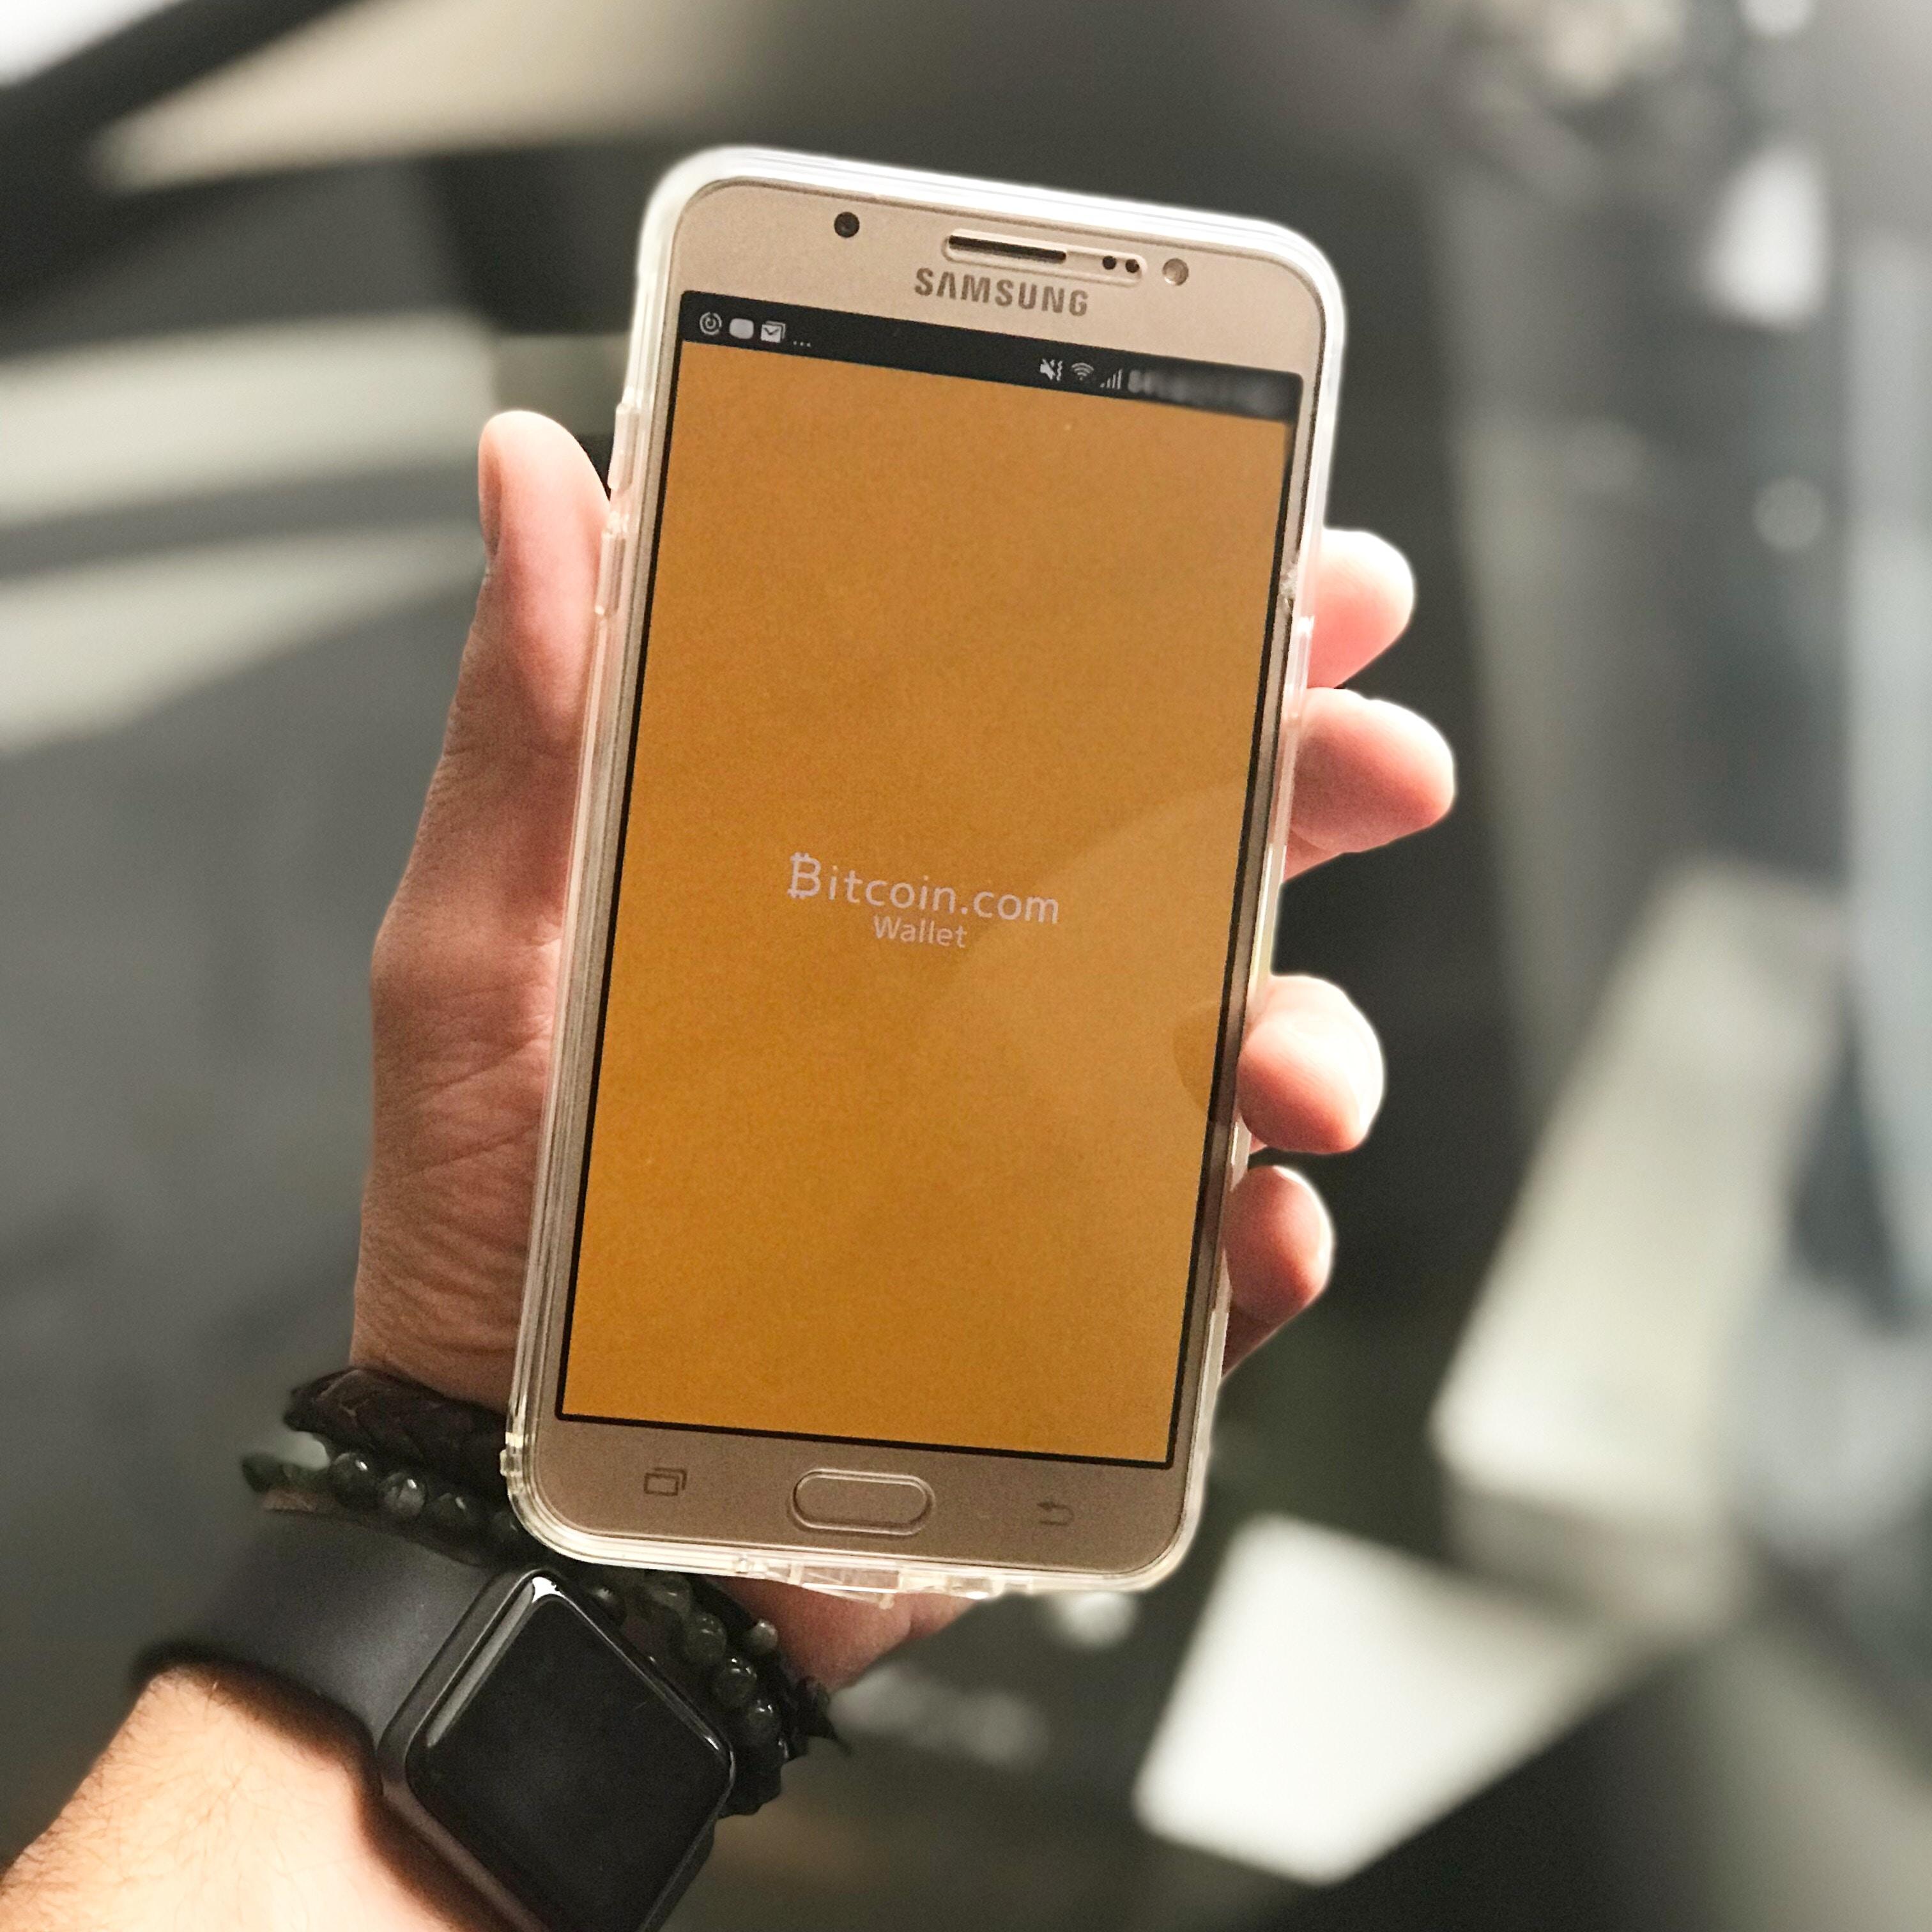 person using Samsung smartphone